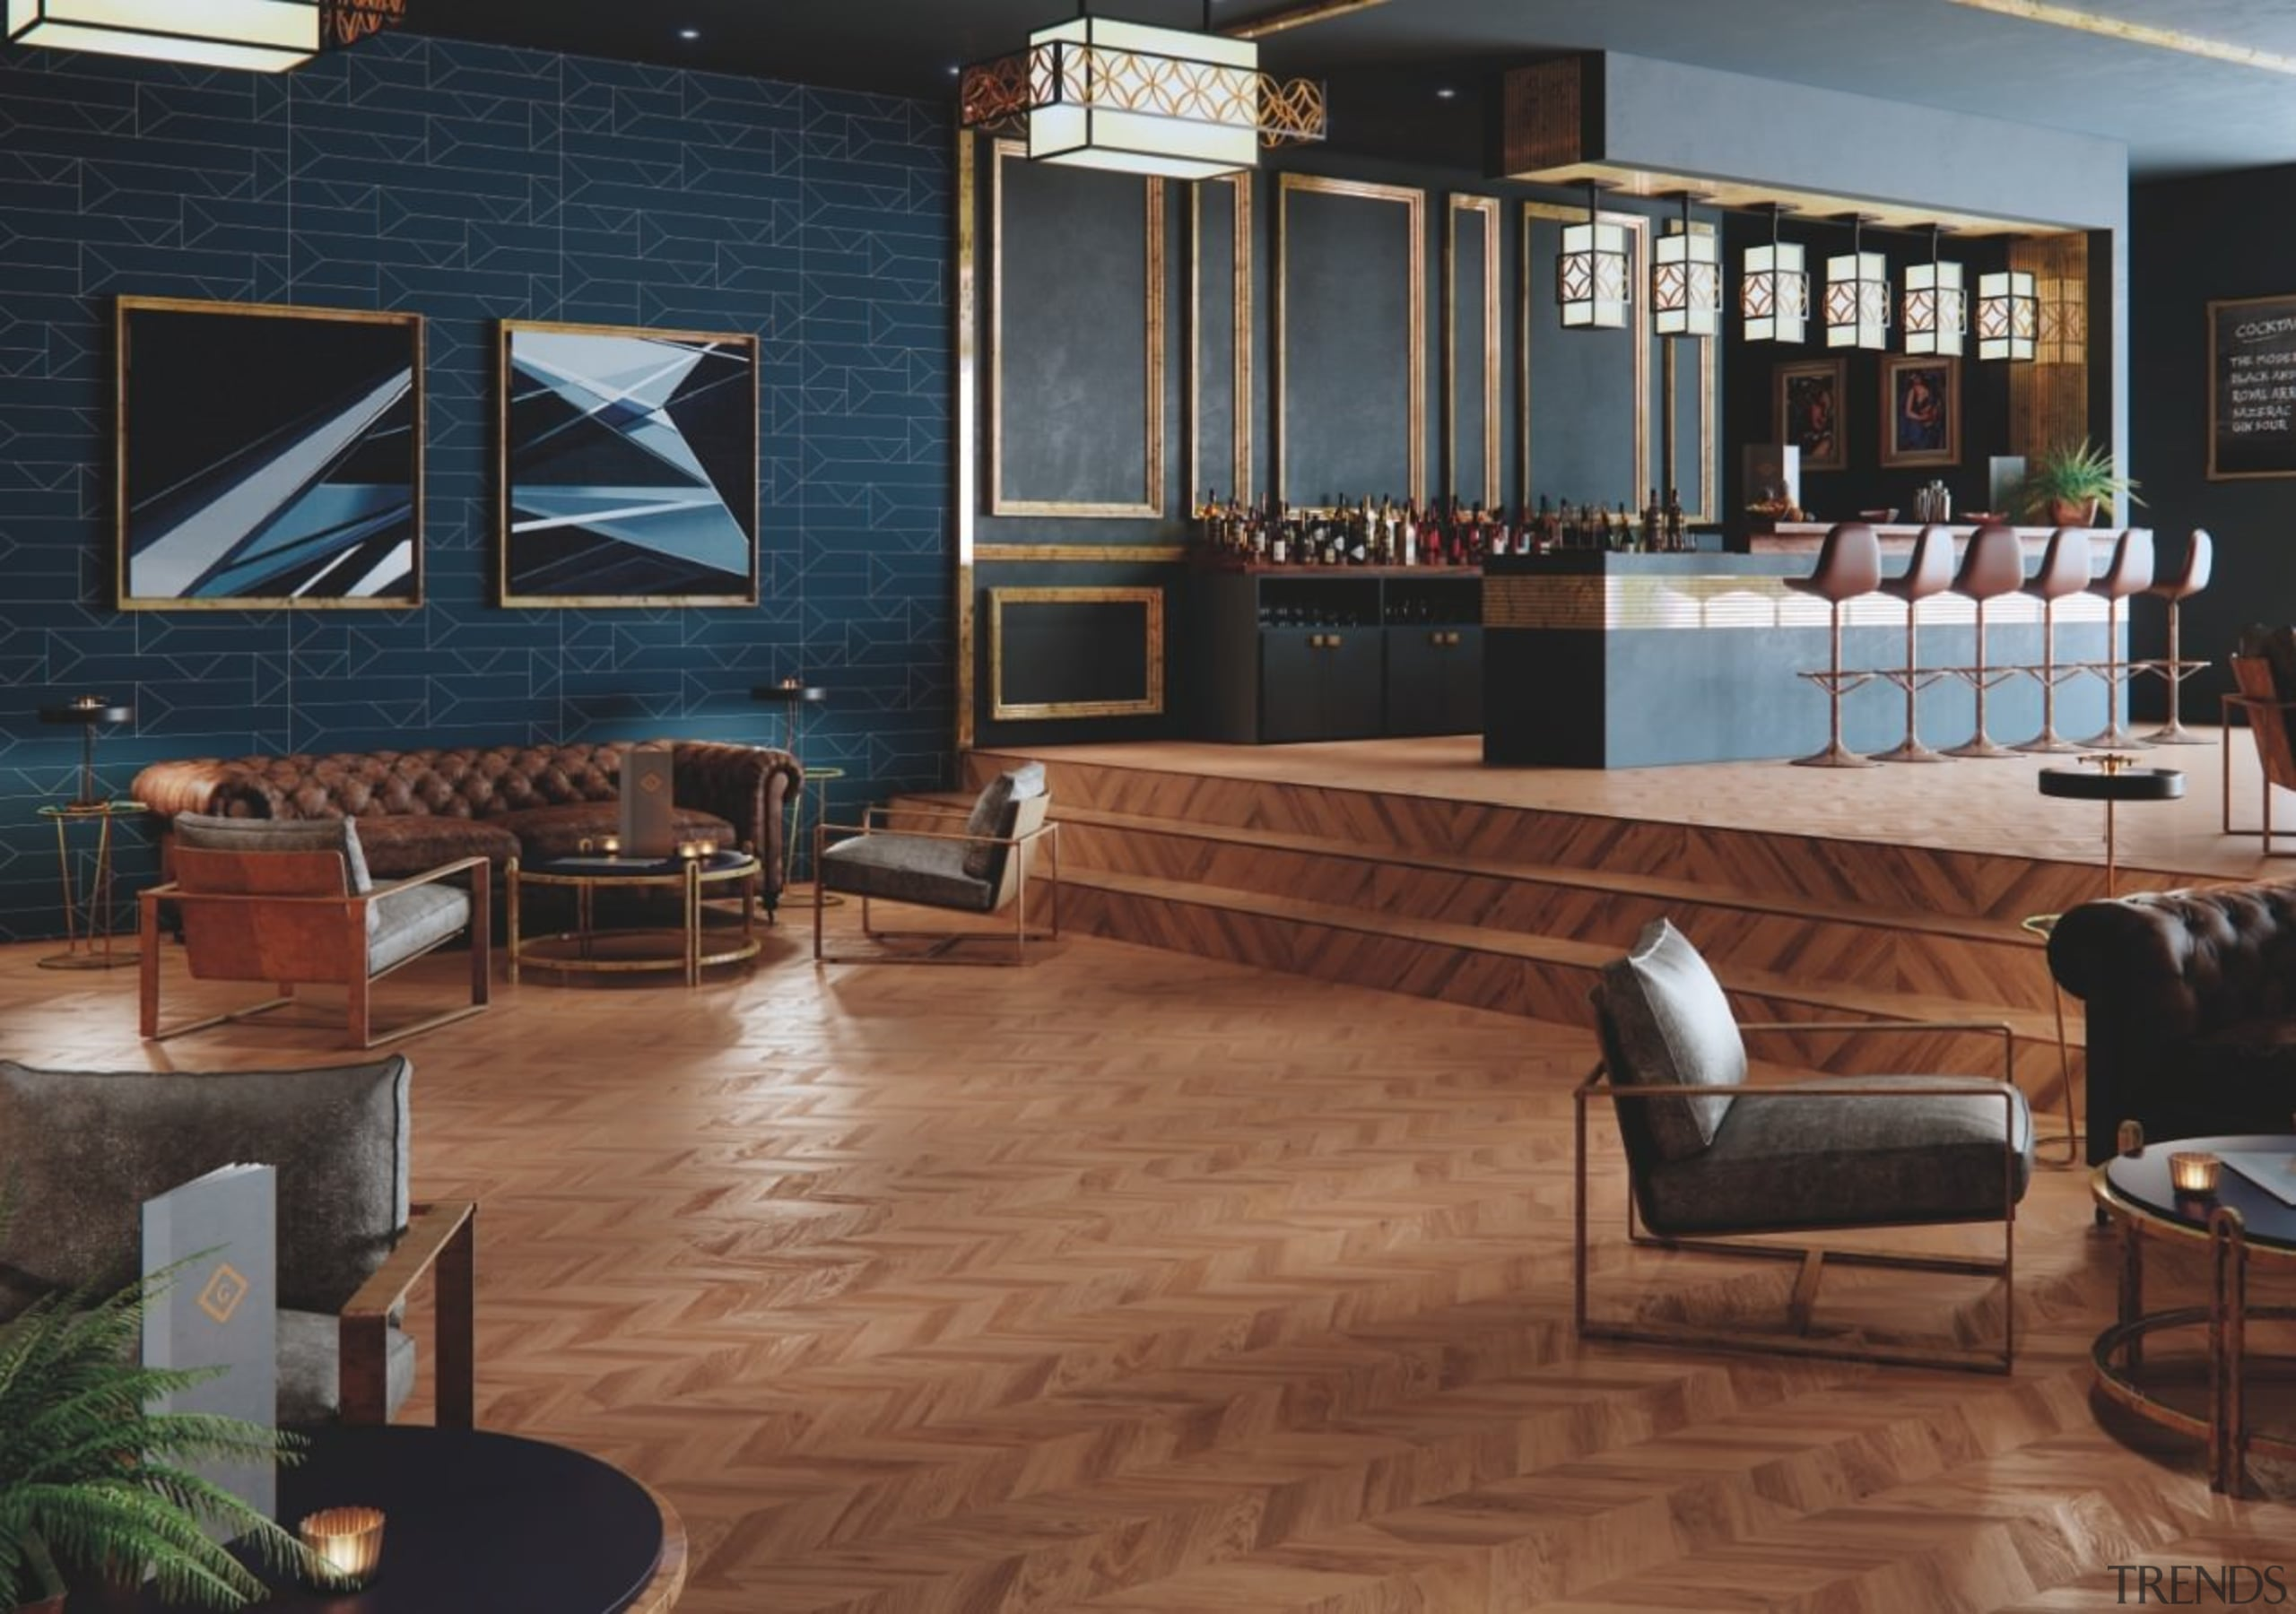 Installing Expona Commercial flooring solutions isn't taxing. floor, flooring, hardwood, interior design, living room, lobby, wood flooring, brown, black